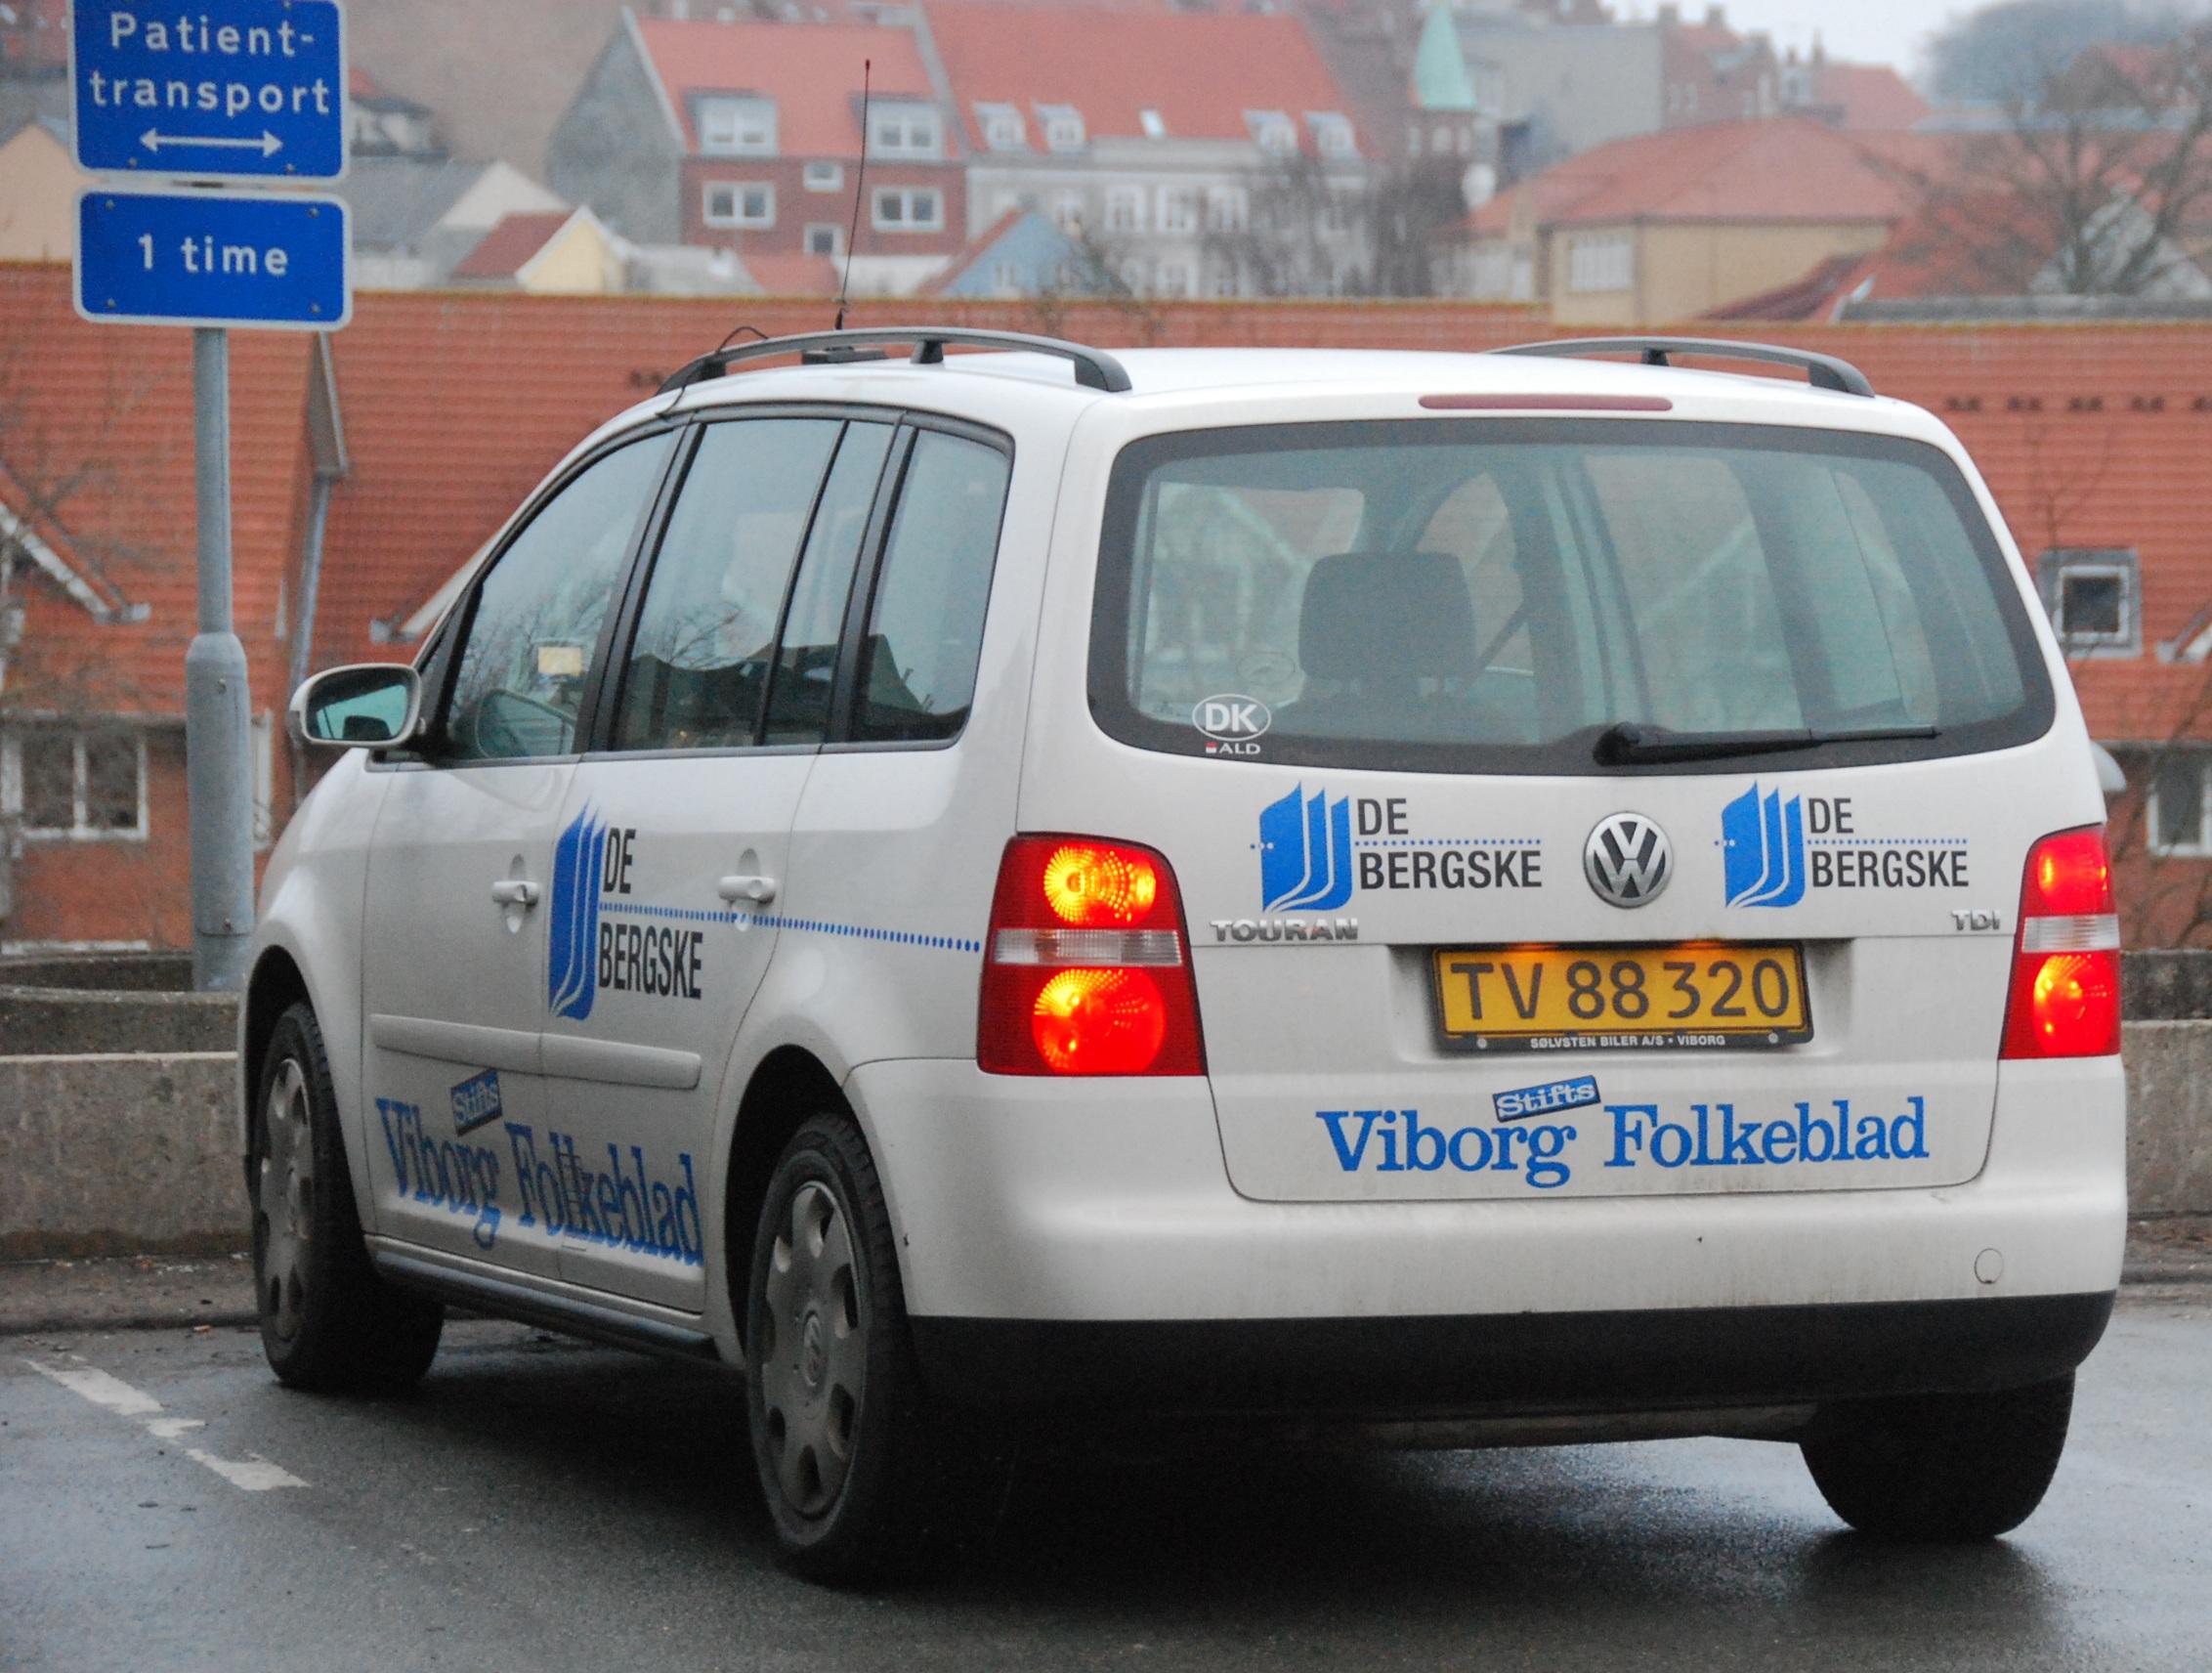 doc viborg stifts folkeblad